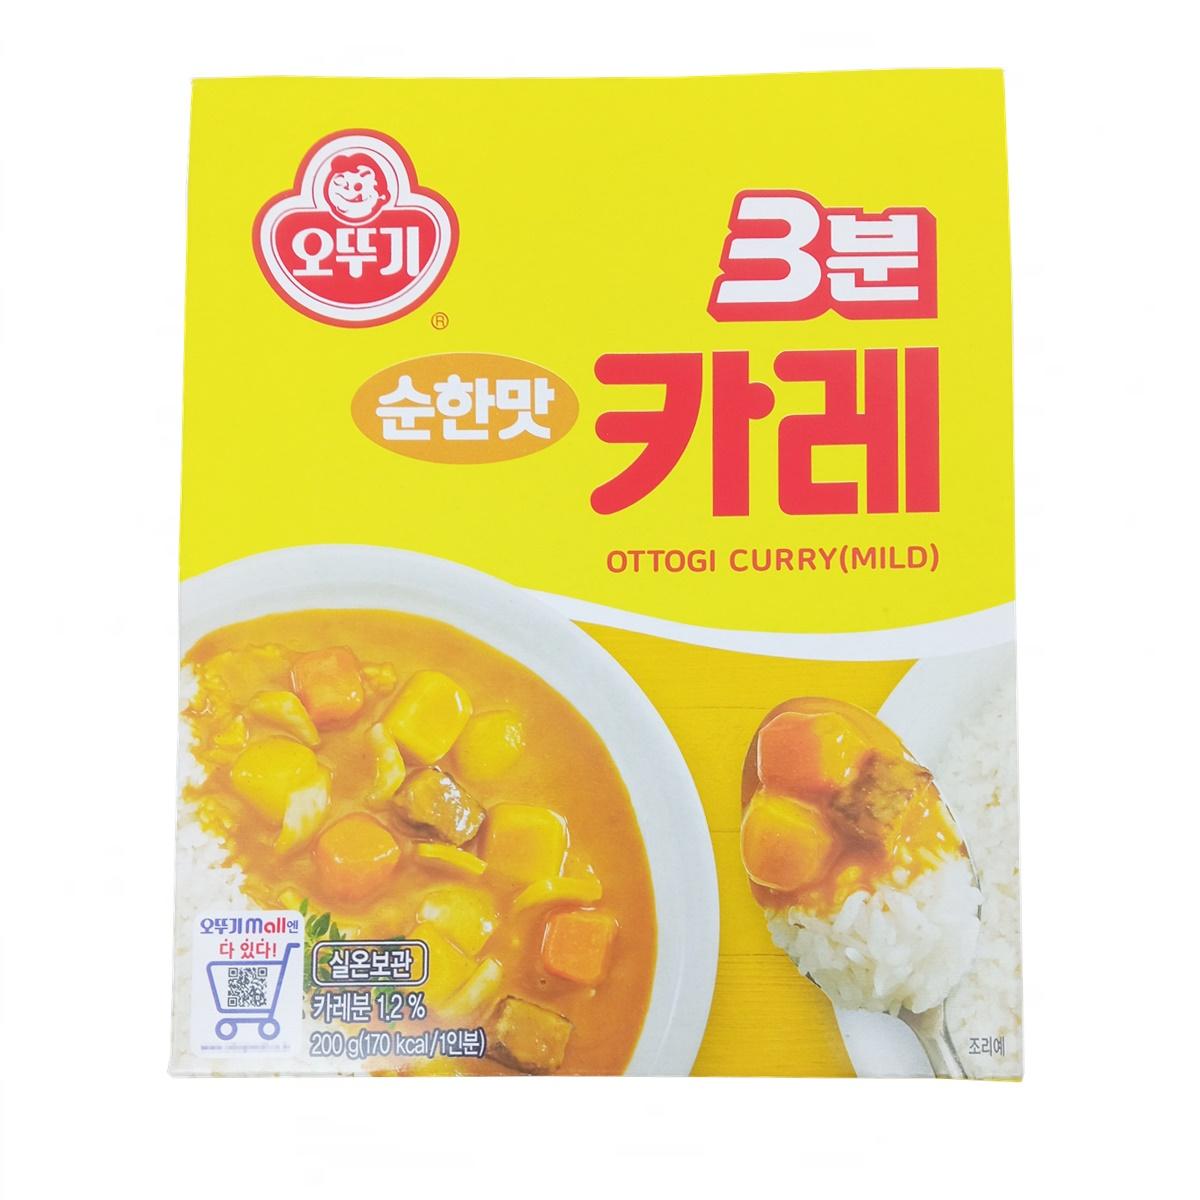 Molho Curry Instantâneo Suave 3min 200g - Ottogi